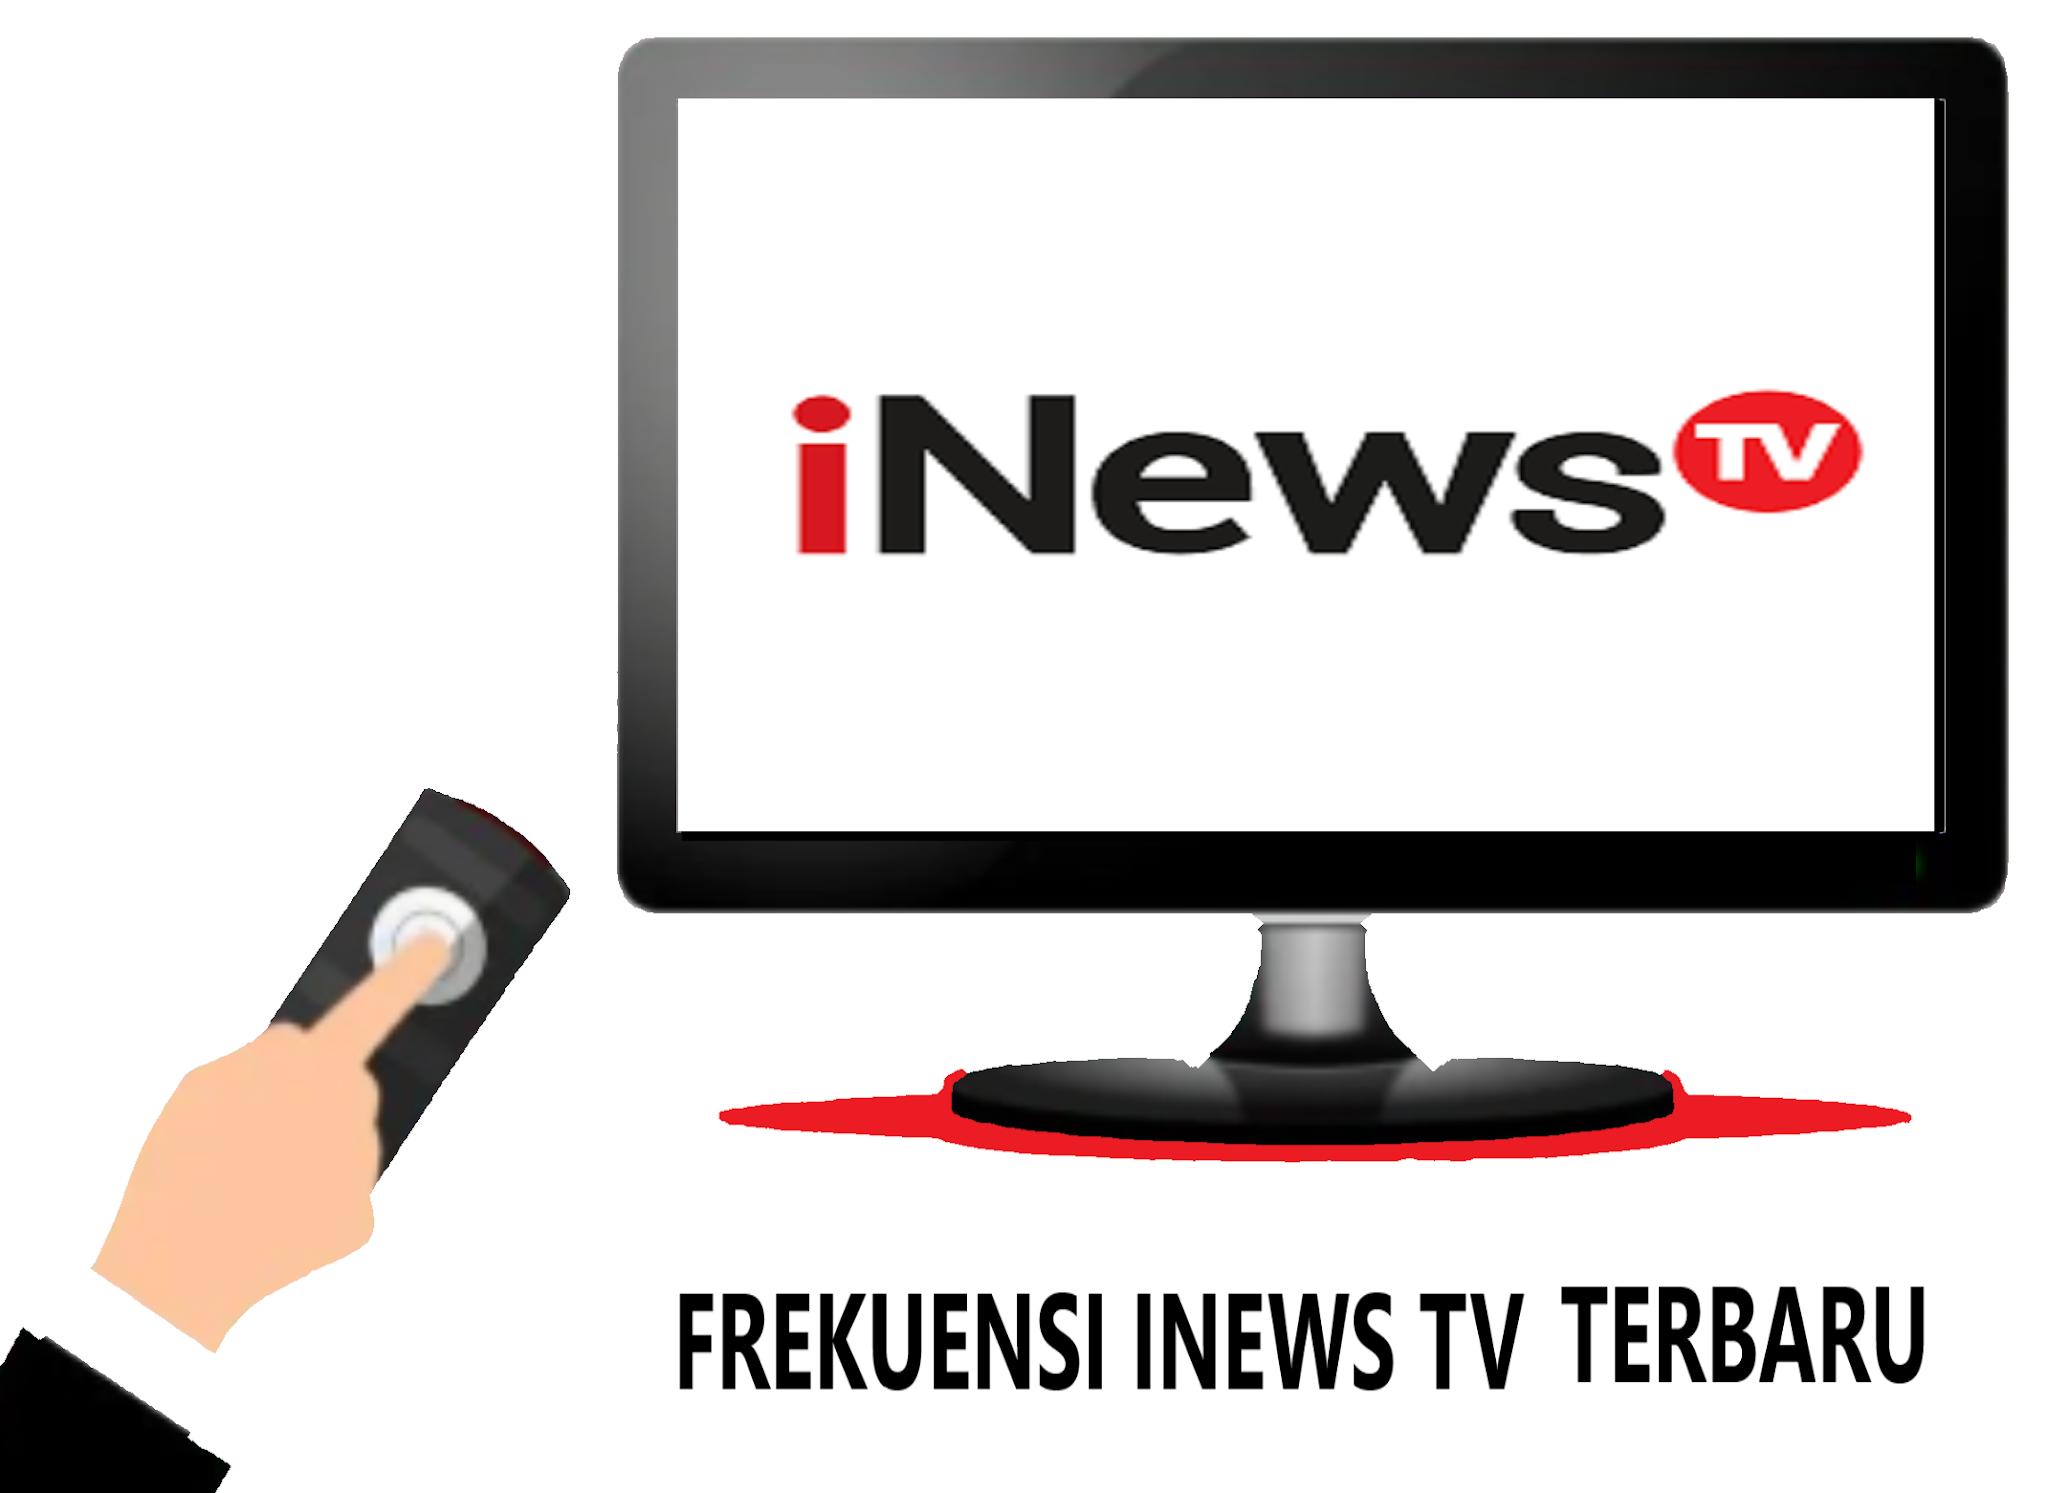 Frekuensi INews TV Terbaru Di Telkom 4 Update 2020